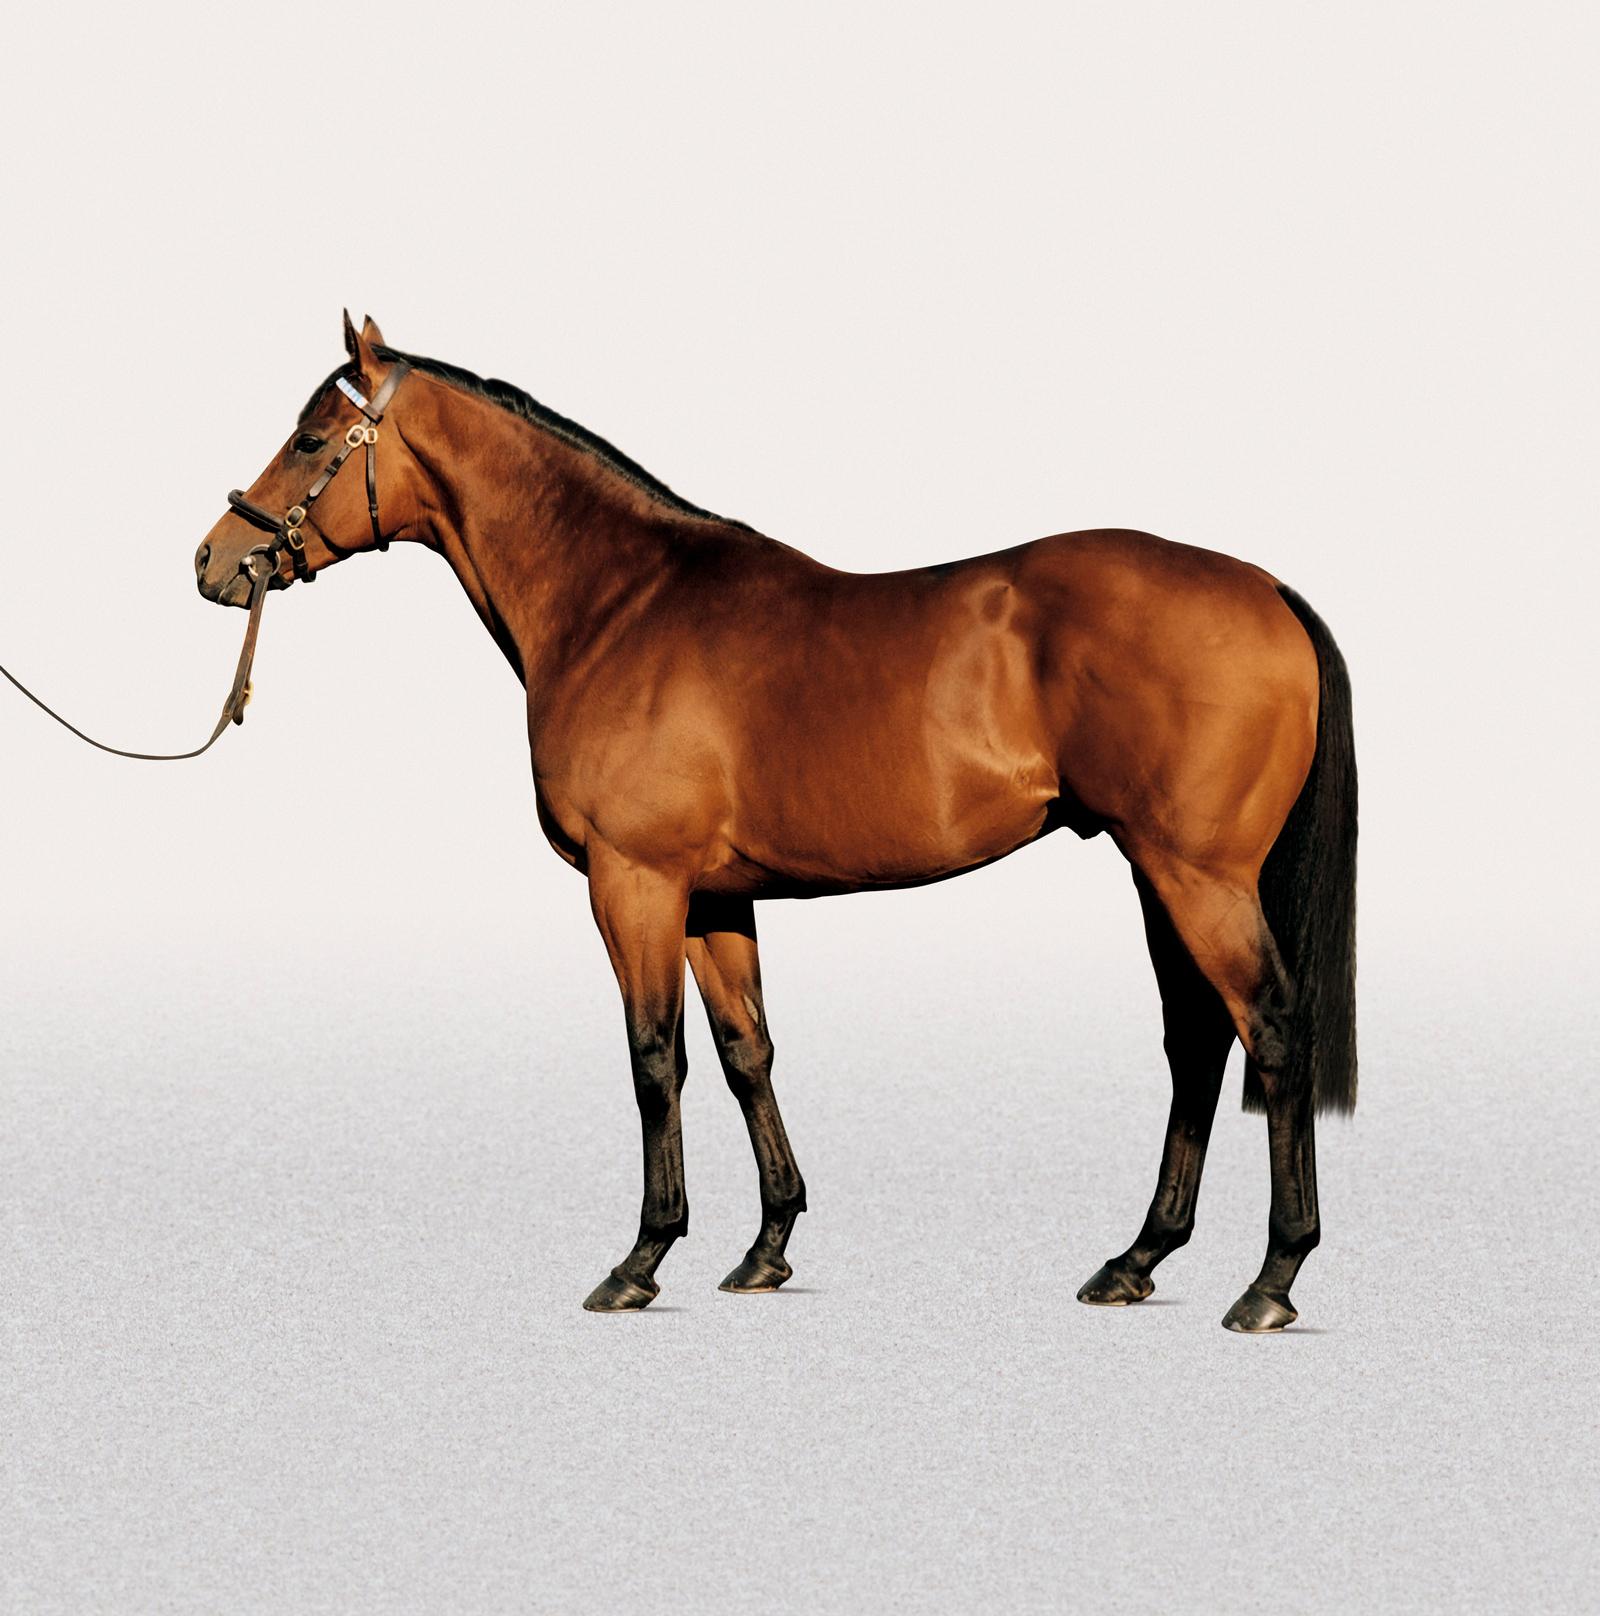 https://www.stallions.com.au/wp-content/uploads/2020/08/Dubawi.jpg